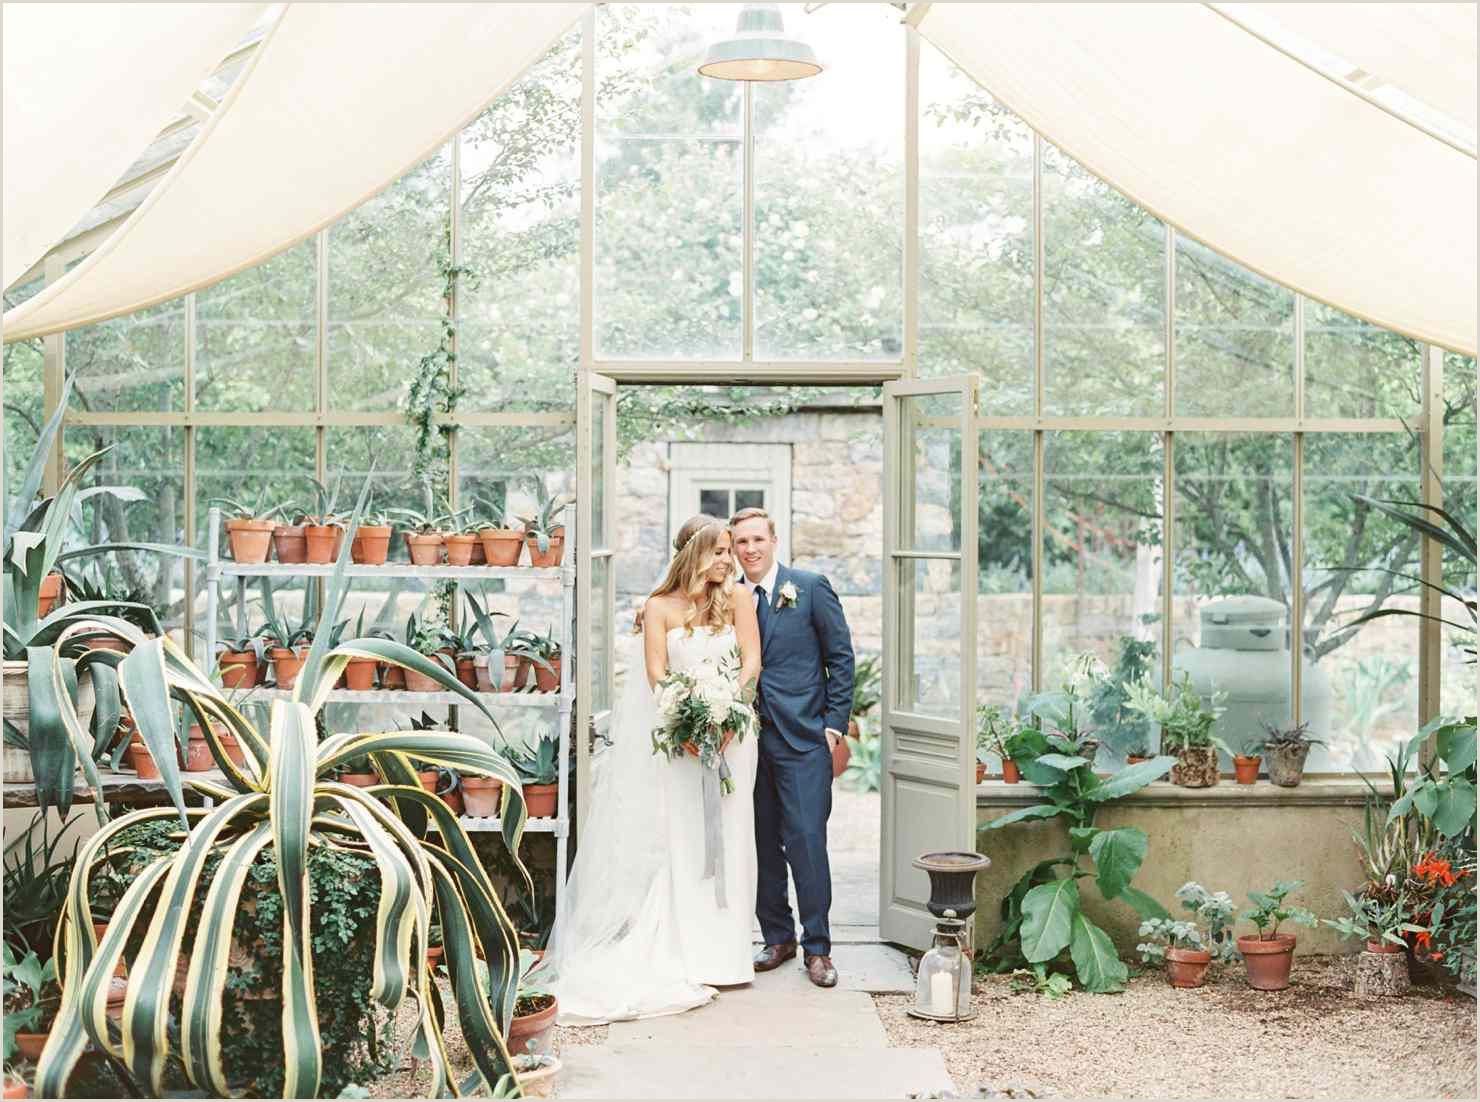 9 Lush Greenhouse Wedding Venues Around the World